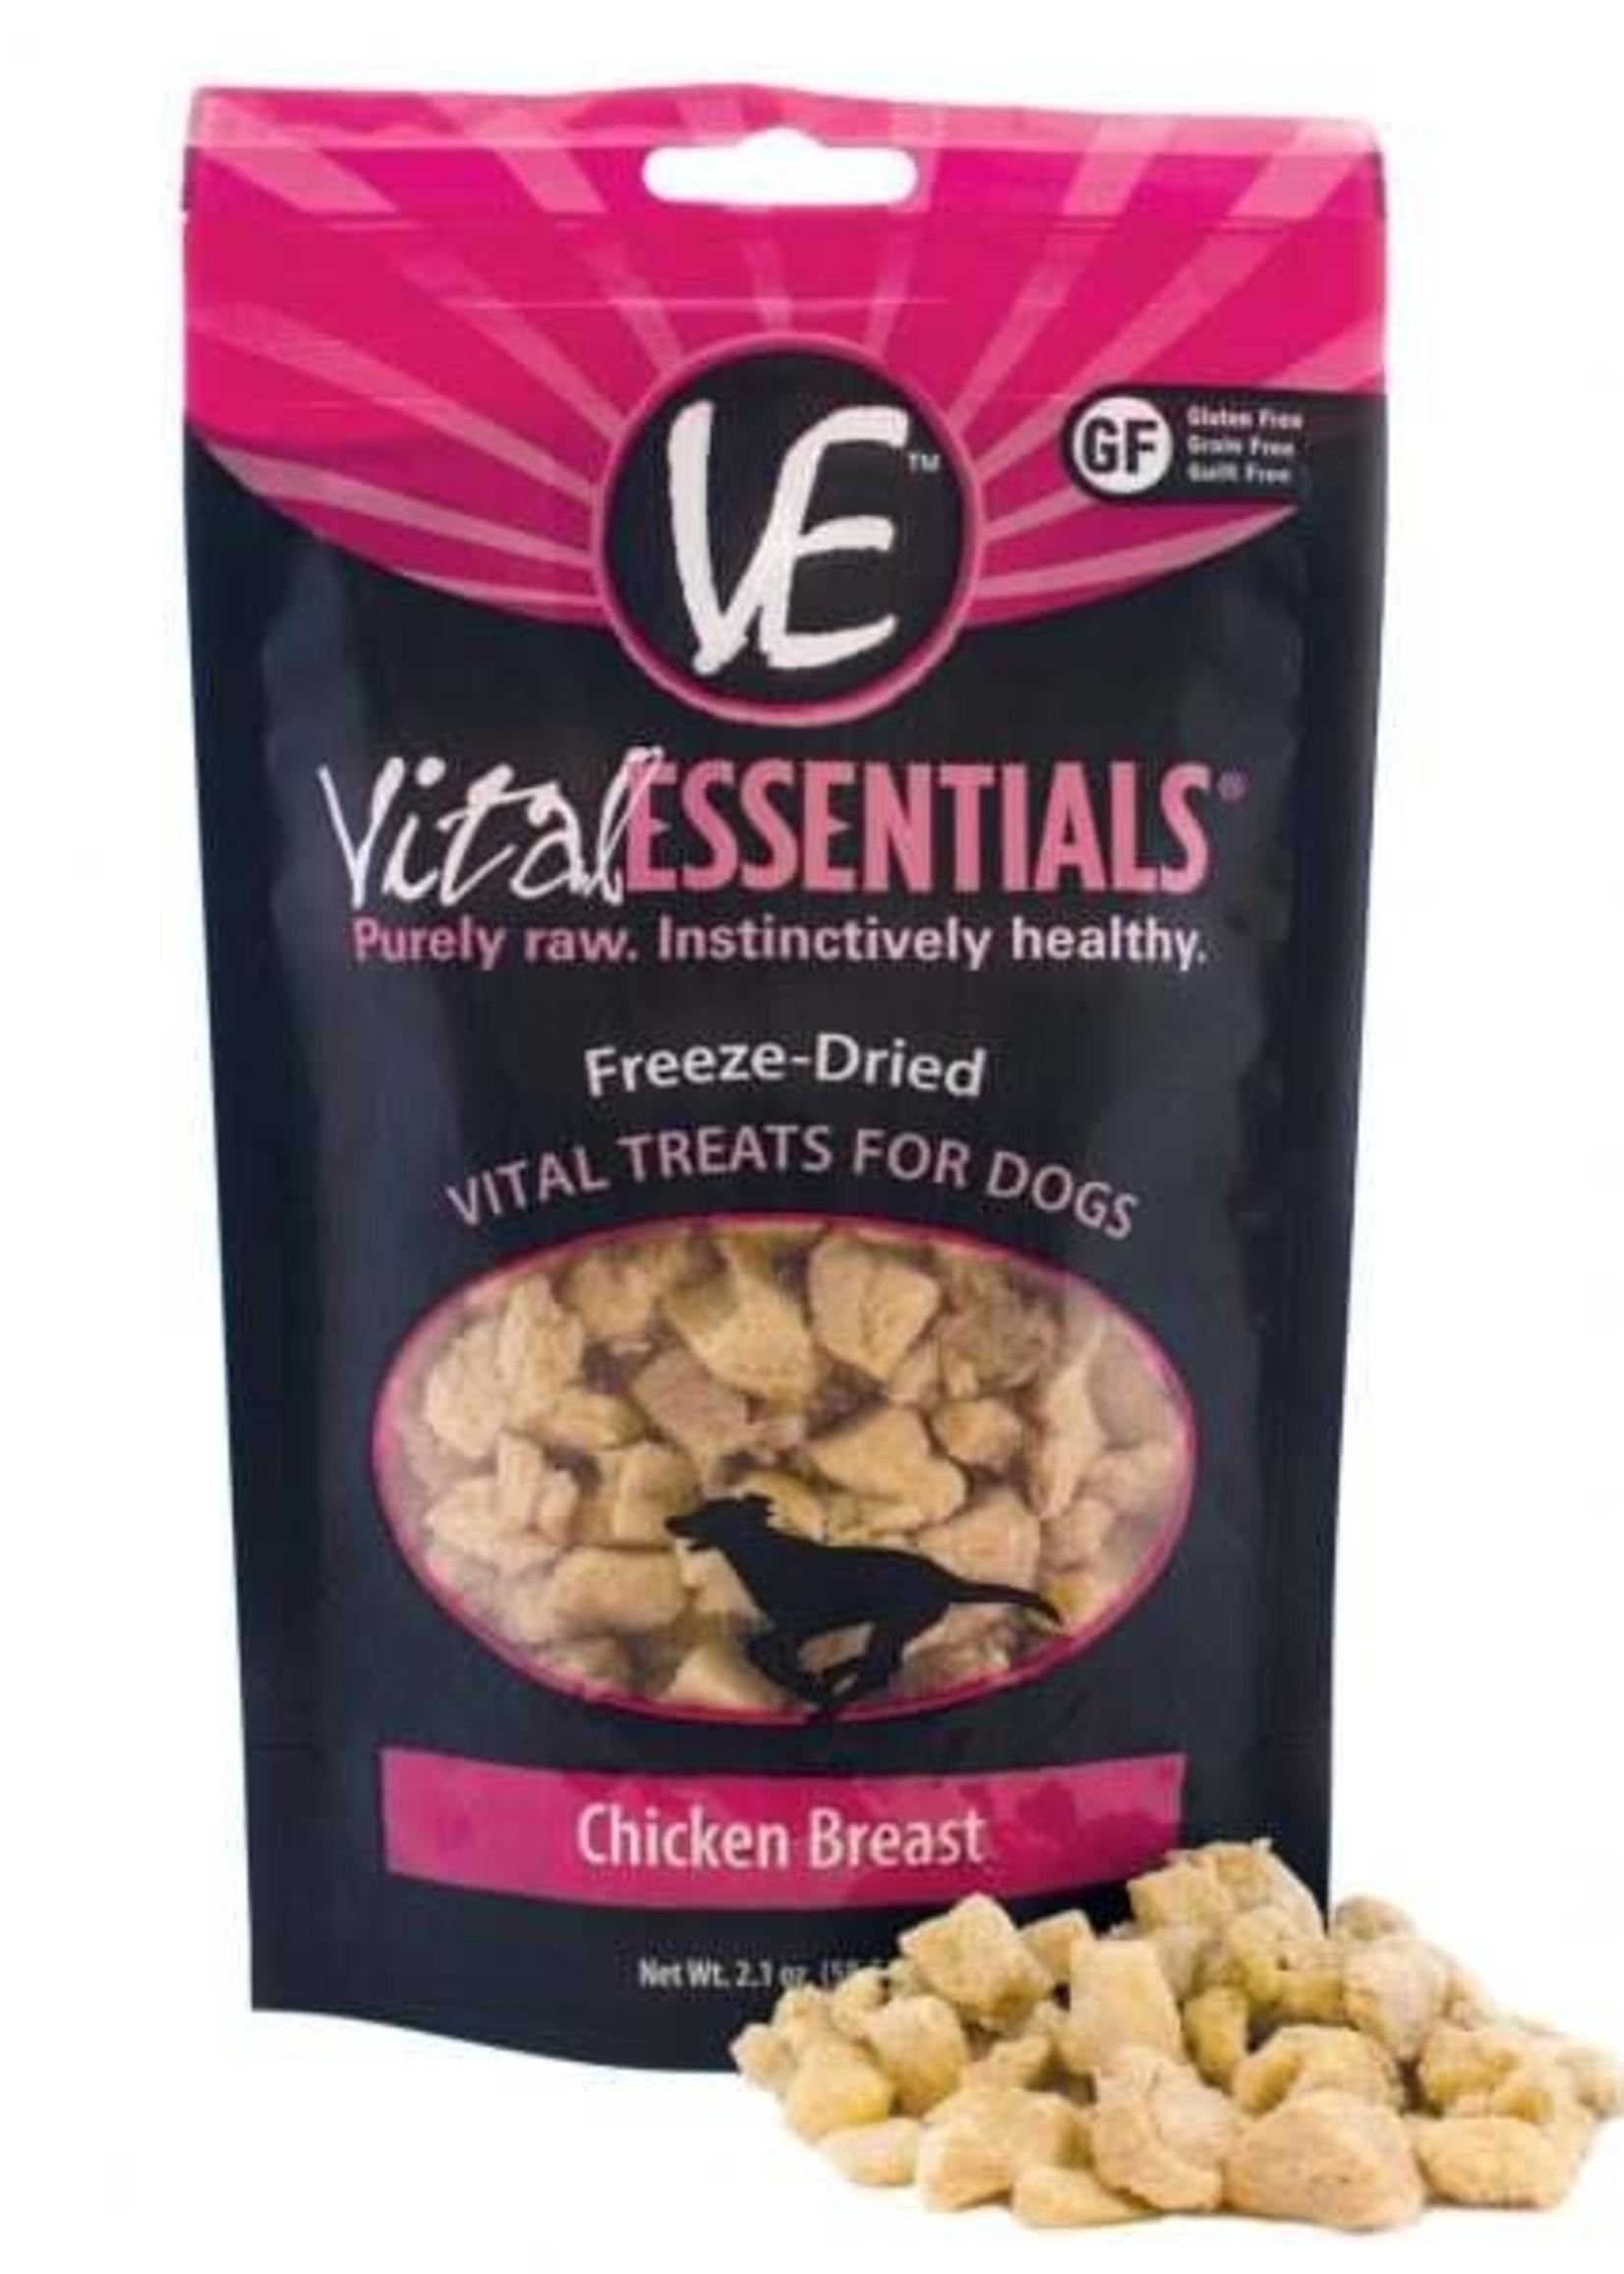 Vital Essentials Vital Essentials Freeze Dried Chicken Breast 2.1 oz